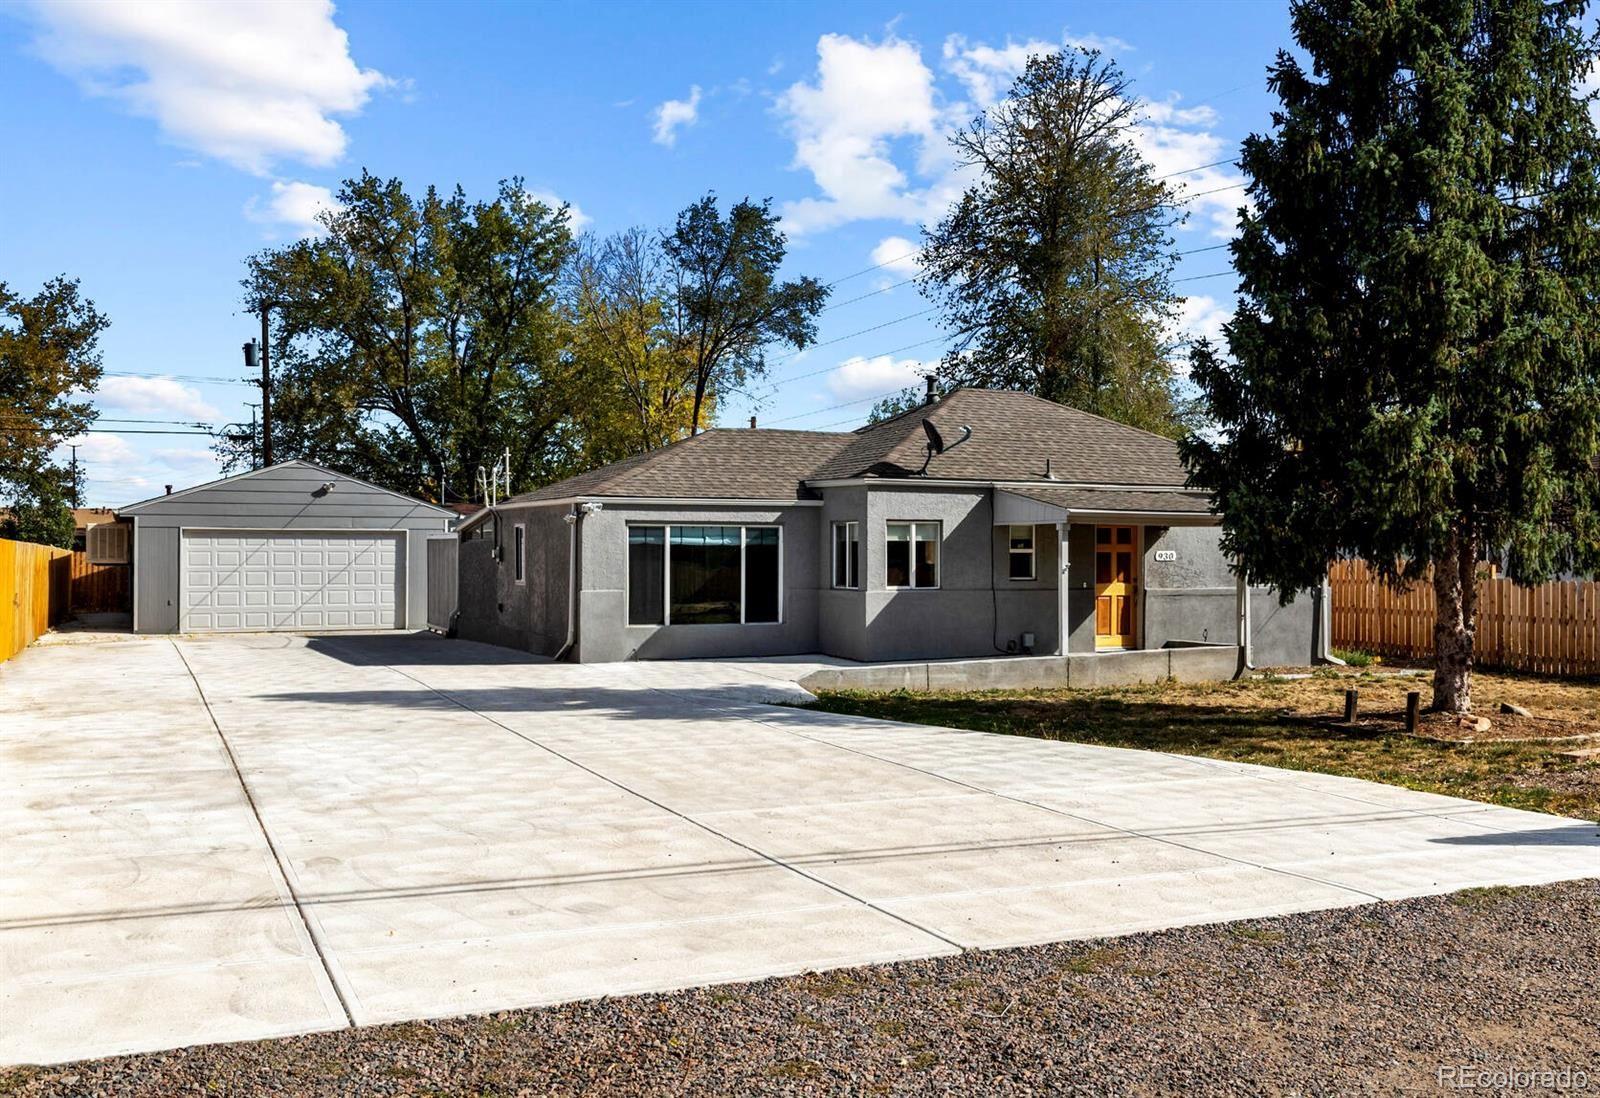 930 Carr Street, Lakewood, CO 80214 - #: 4501276